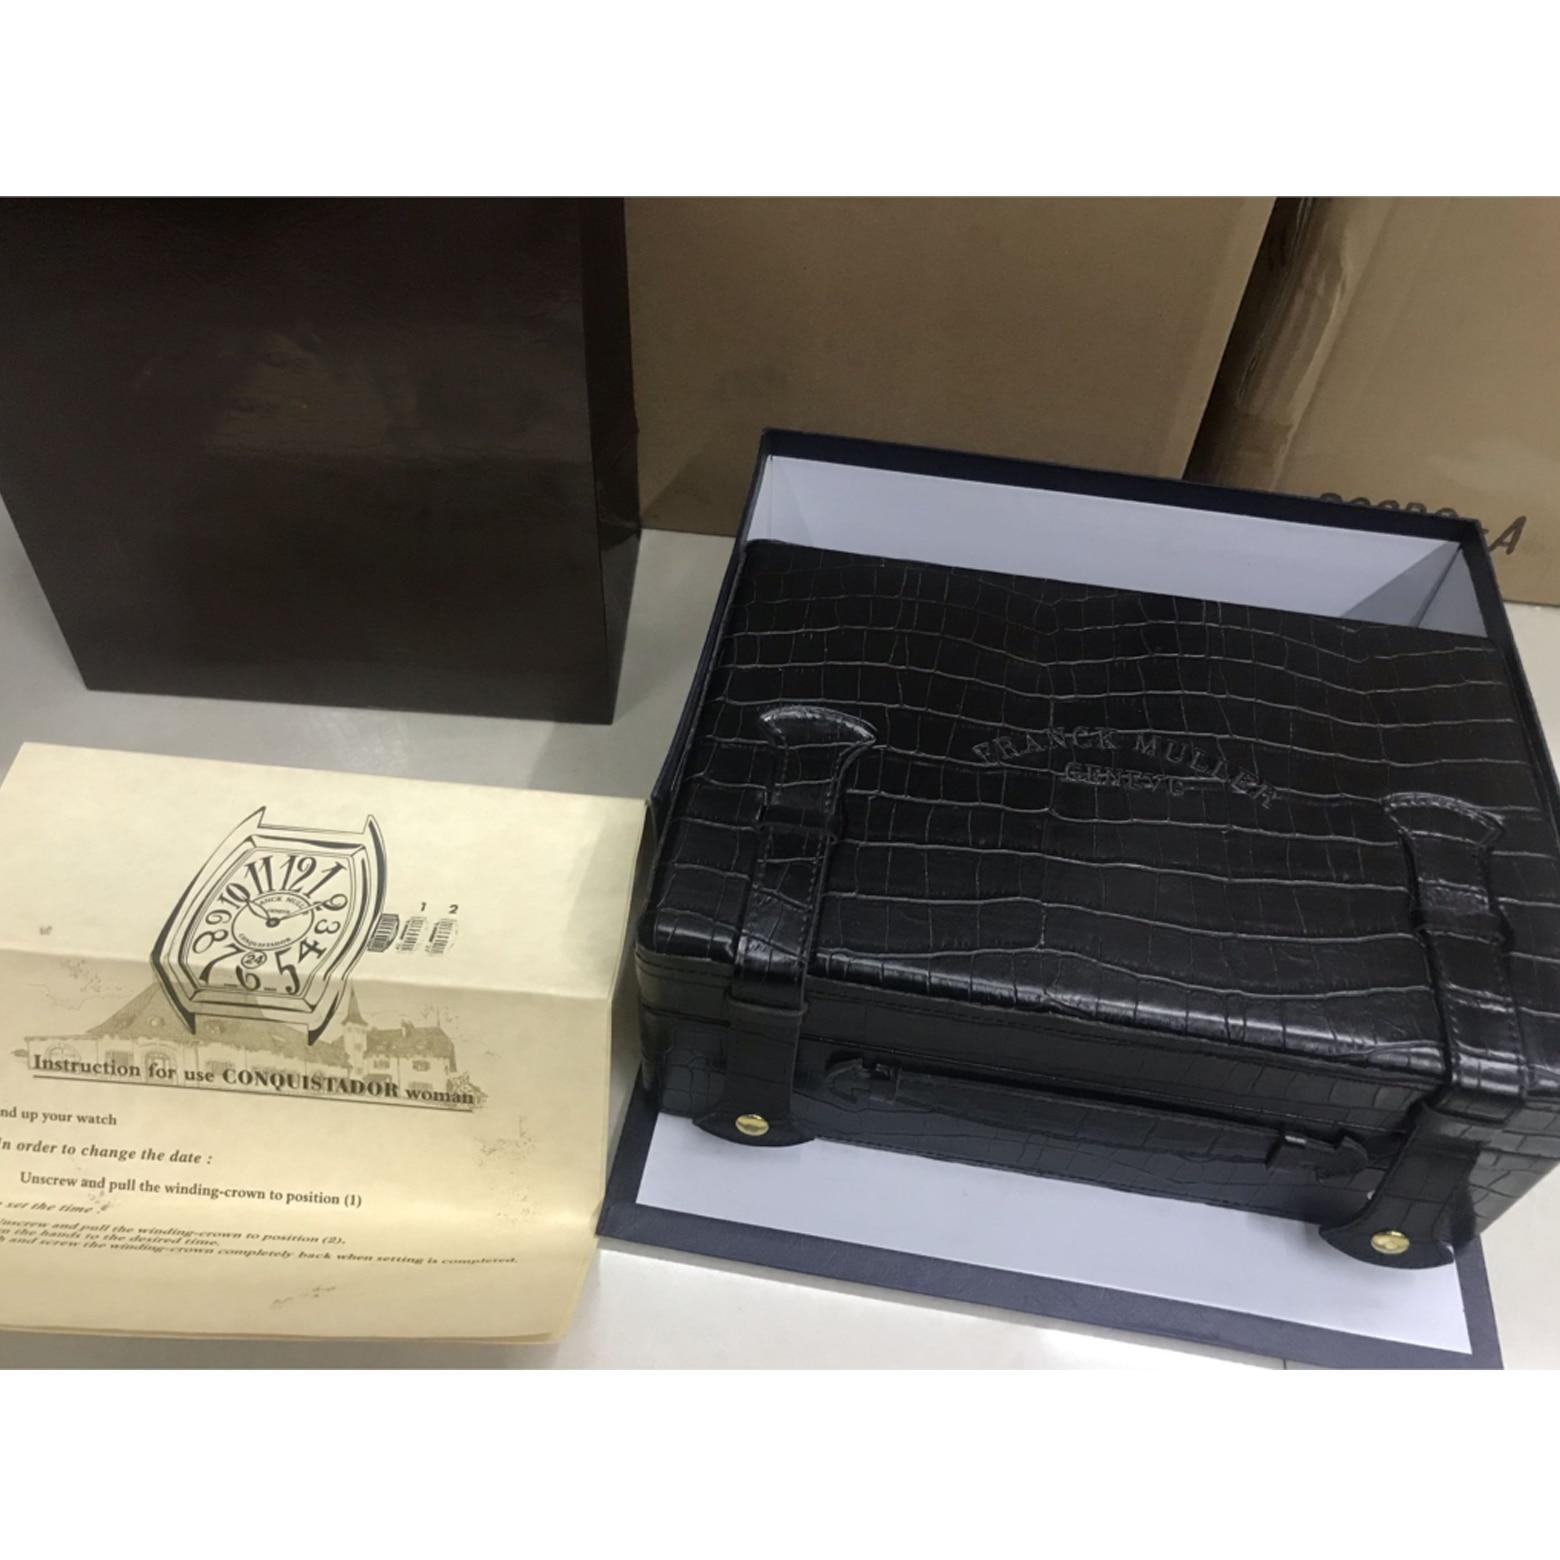 Top version luxury  watch box V45 SC DT YACHTING Crocodile Leather Bag  ETA 2824 SA2824  7750